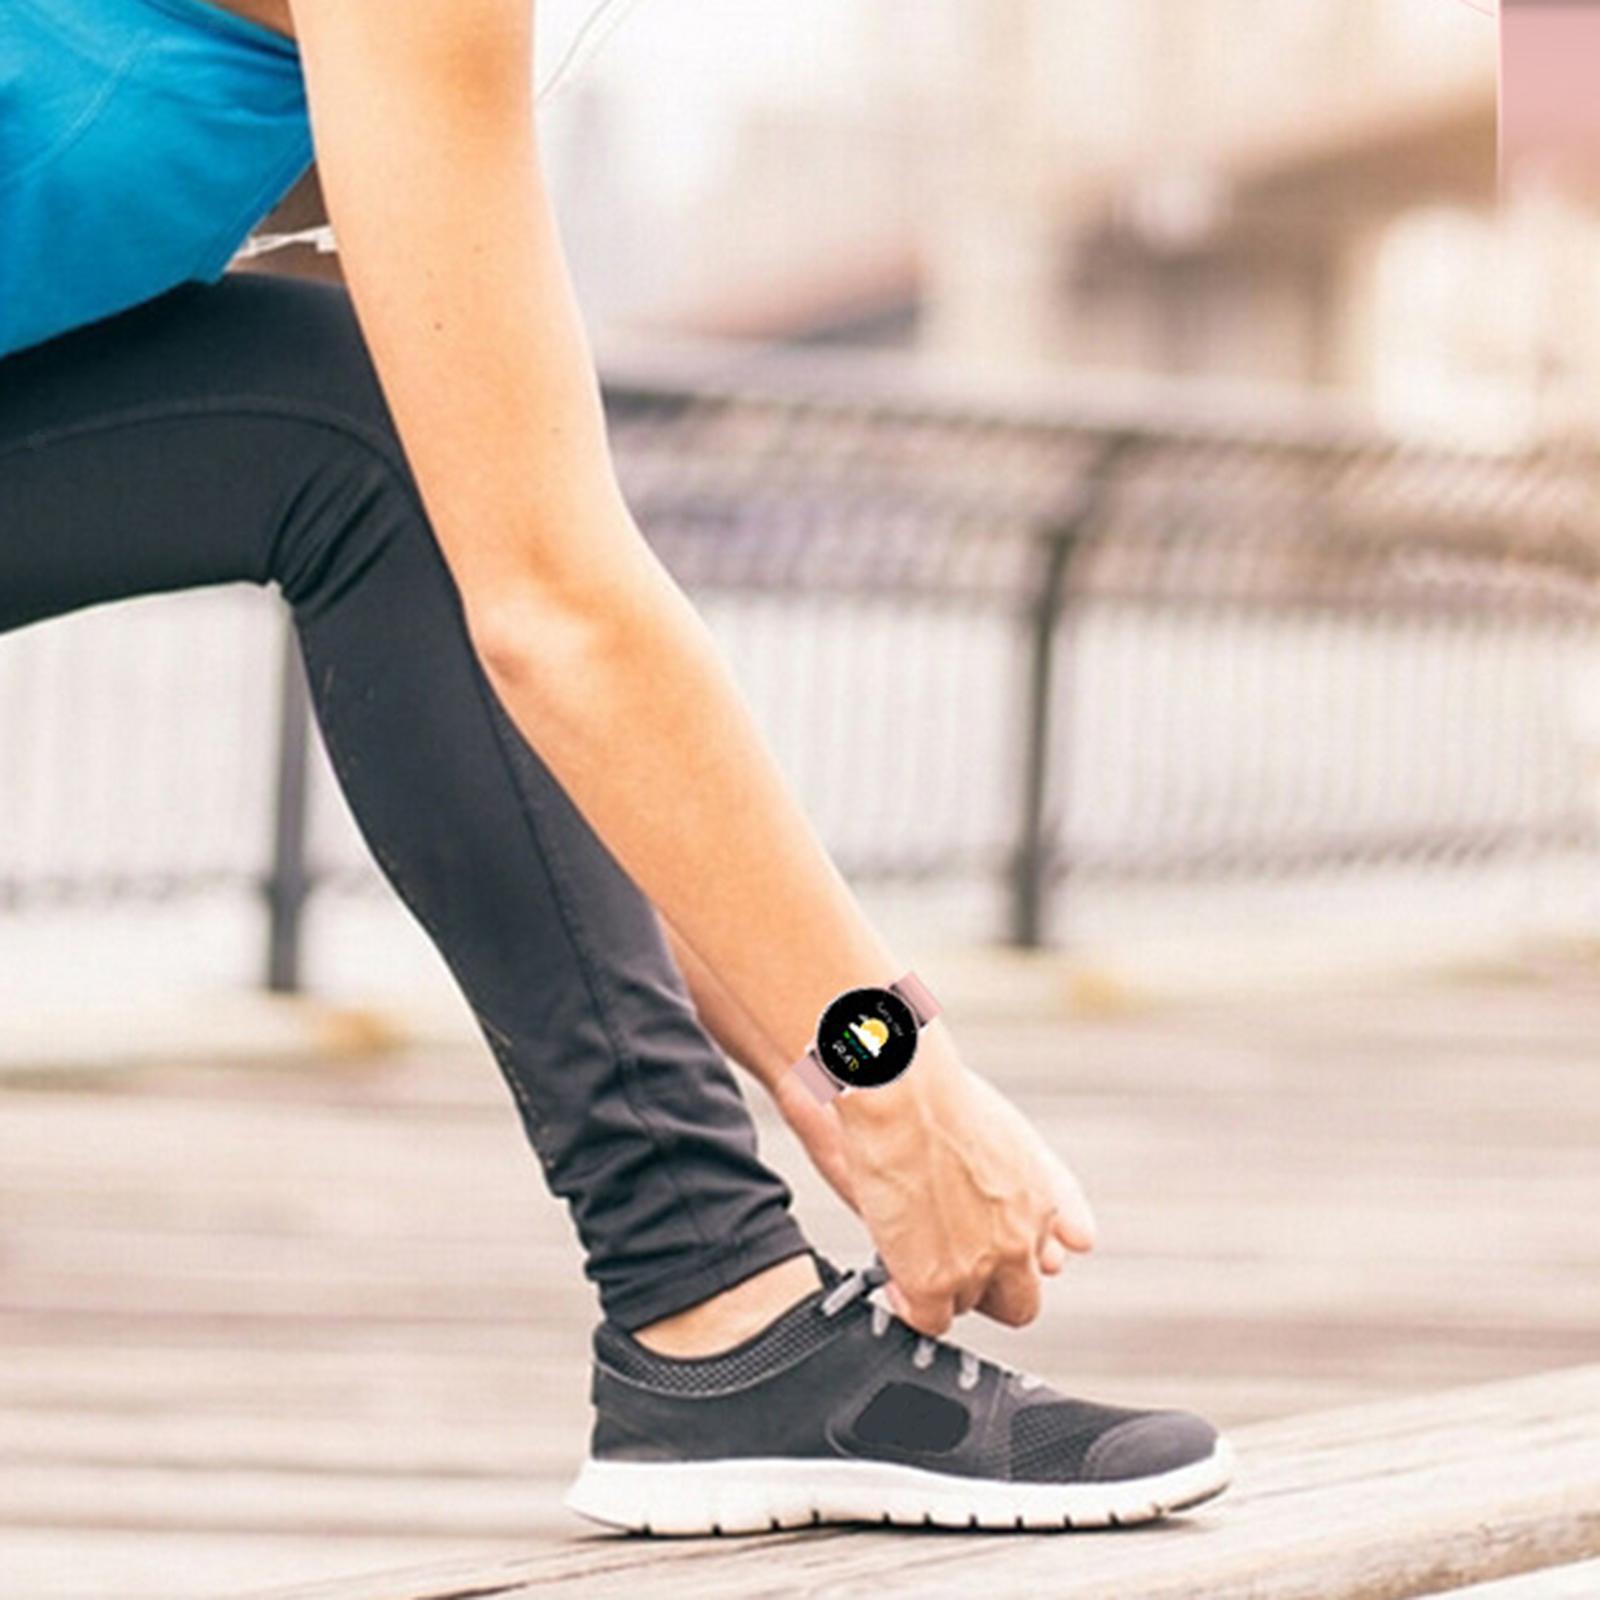 miniature 18 - Étanche Femmes Montre Intelligente Bracelet Sport Fitness Tracker Mode